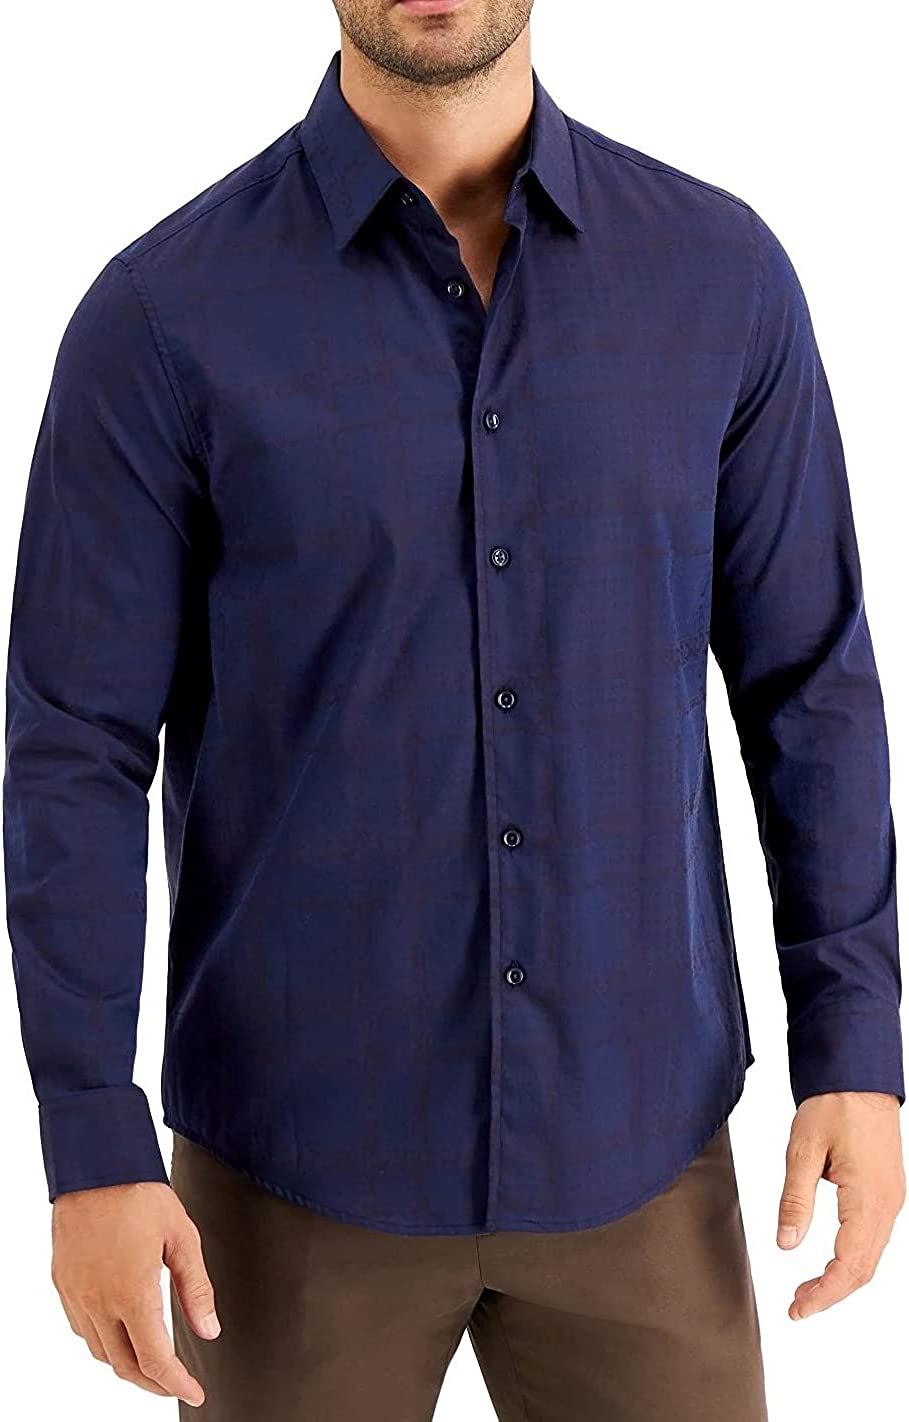 Tasso Elba Mens Shirt Navy Plaid Paisley Print Button Up Blue XL